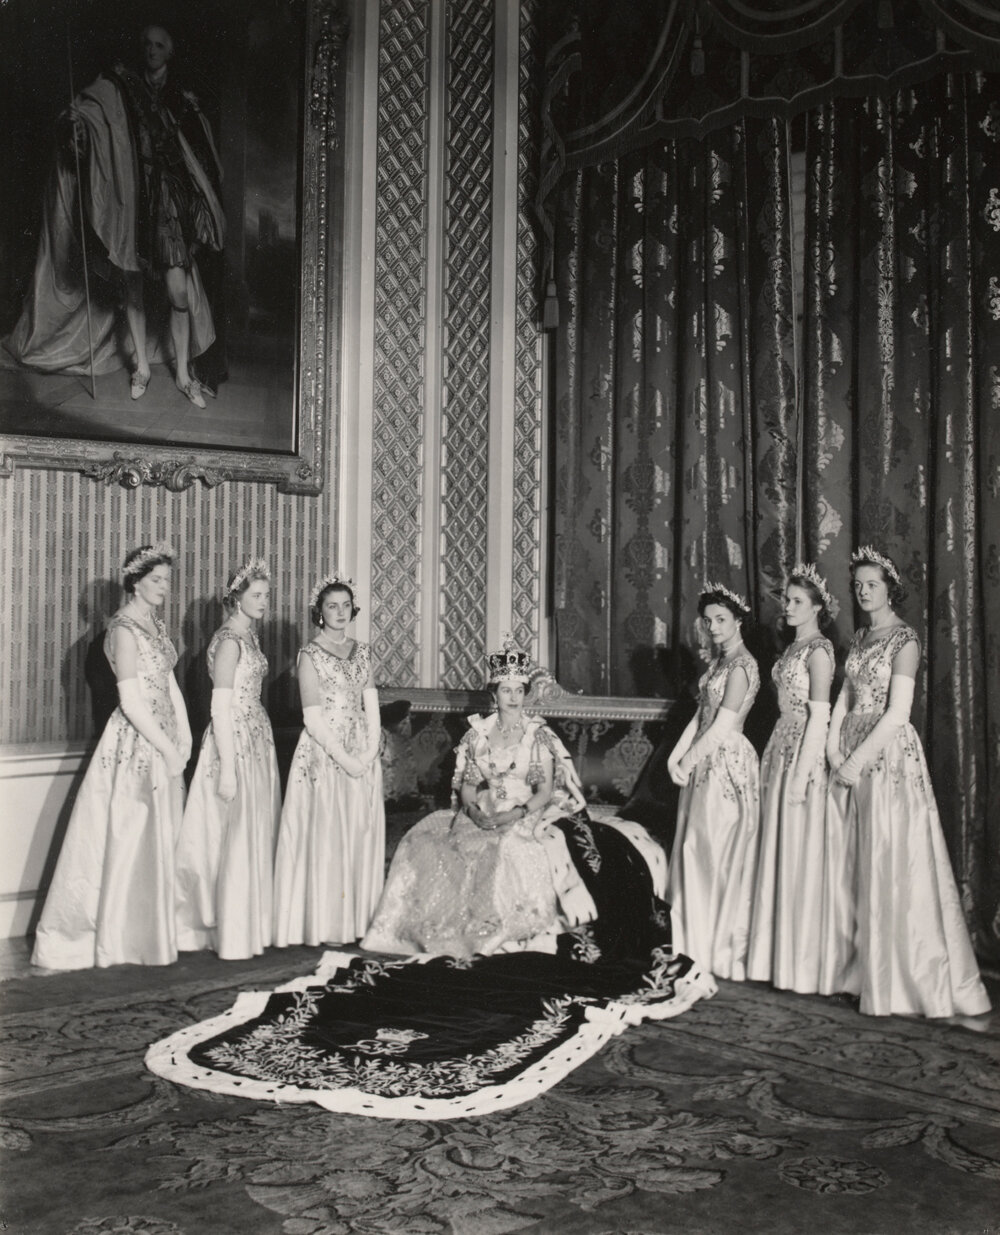 Королева Елизавета II с ее фрейлинами 2 июня 1953 г.